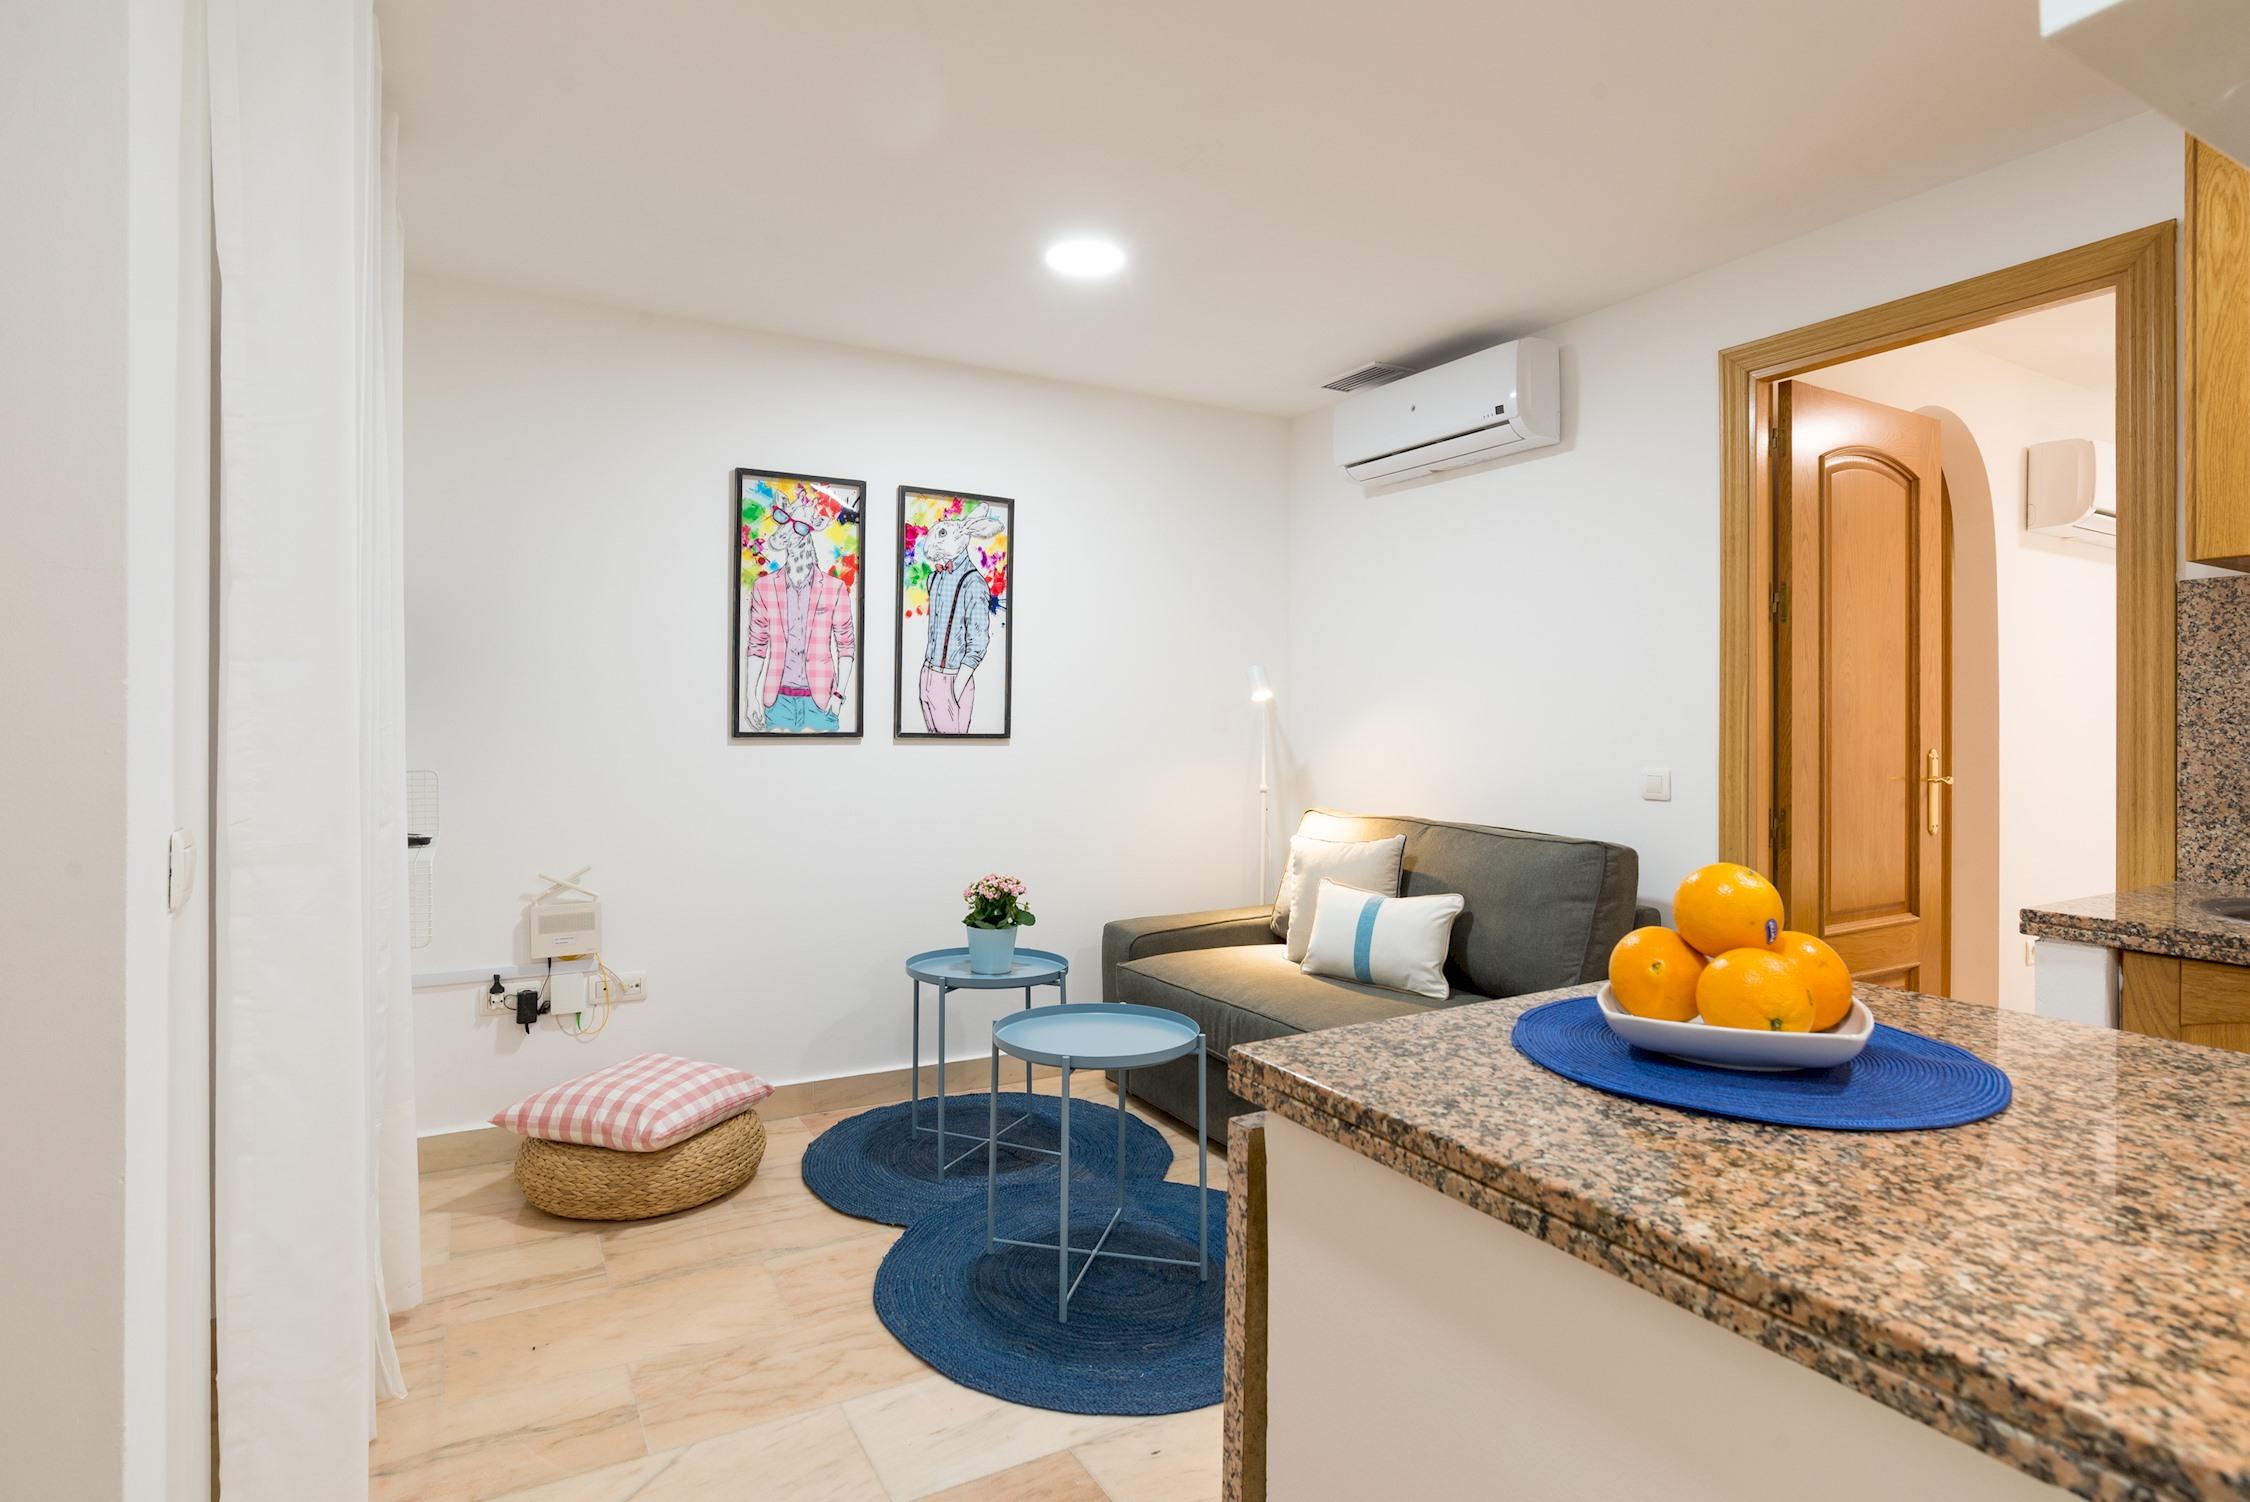 Apartment MalagaSuite Marbella Beach photo 25528480